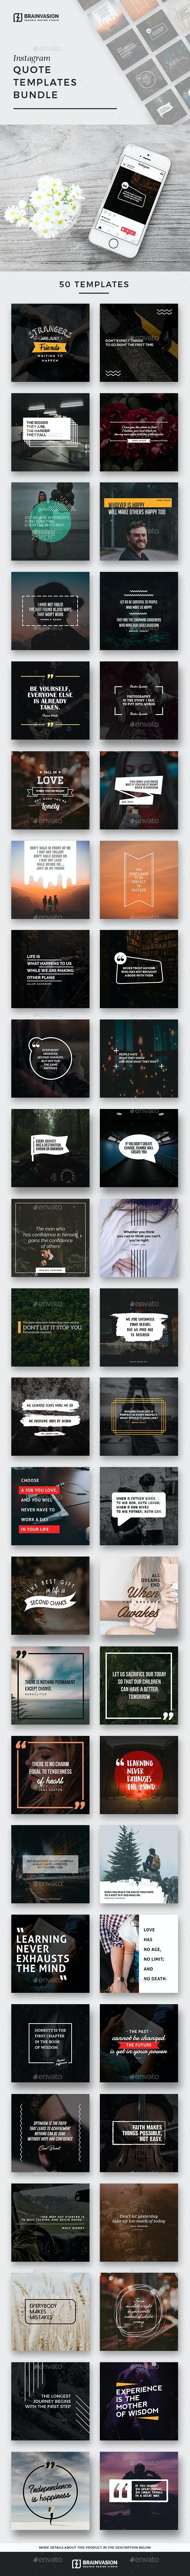 50 Instagram Quote Templates (Bundle) - Miscellaneous Social Media